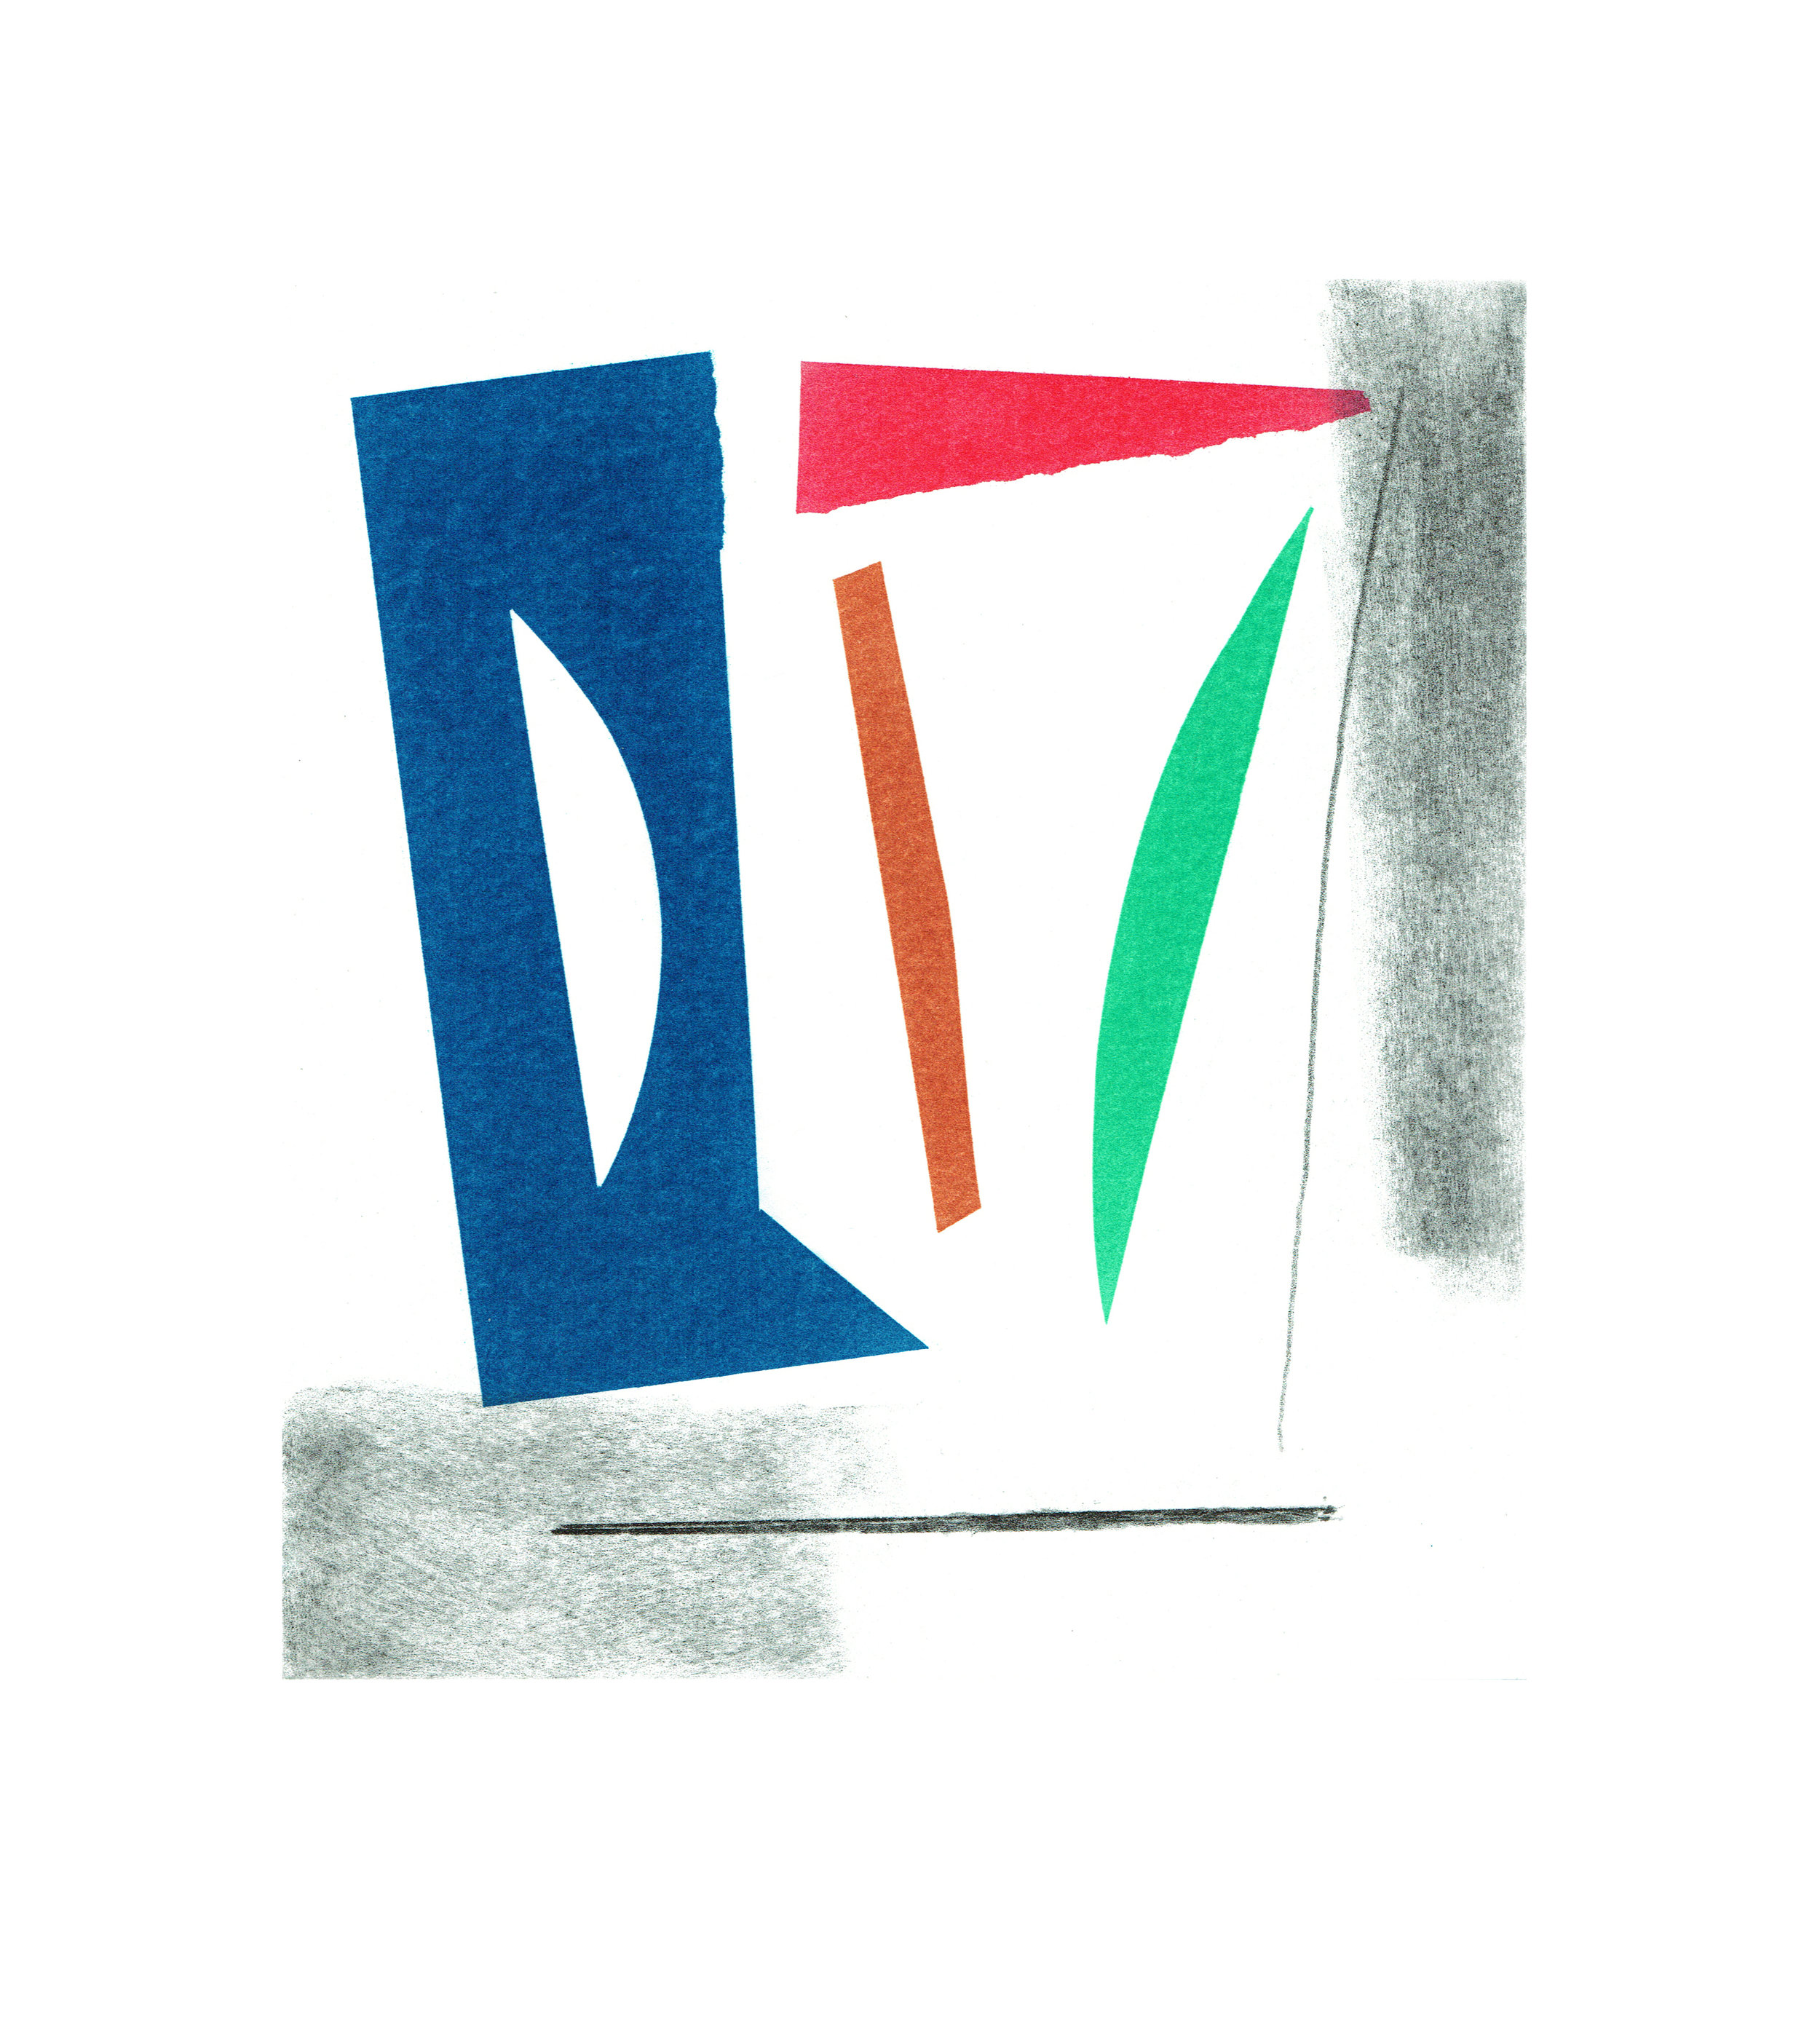 John McLean, Merry Go Round 2    Date: 2016  Size (cm - unframed):  38.2 x 34.4  Technique:  2 plate a la poupee etching  Materials:  Somerset Valvet 300gsm  Edition size:  20  Publisher: The Print Studio  Copyright: The Artist   POA